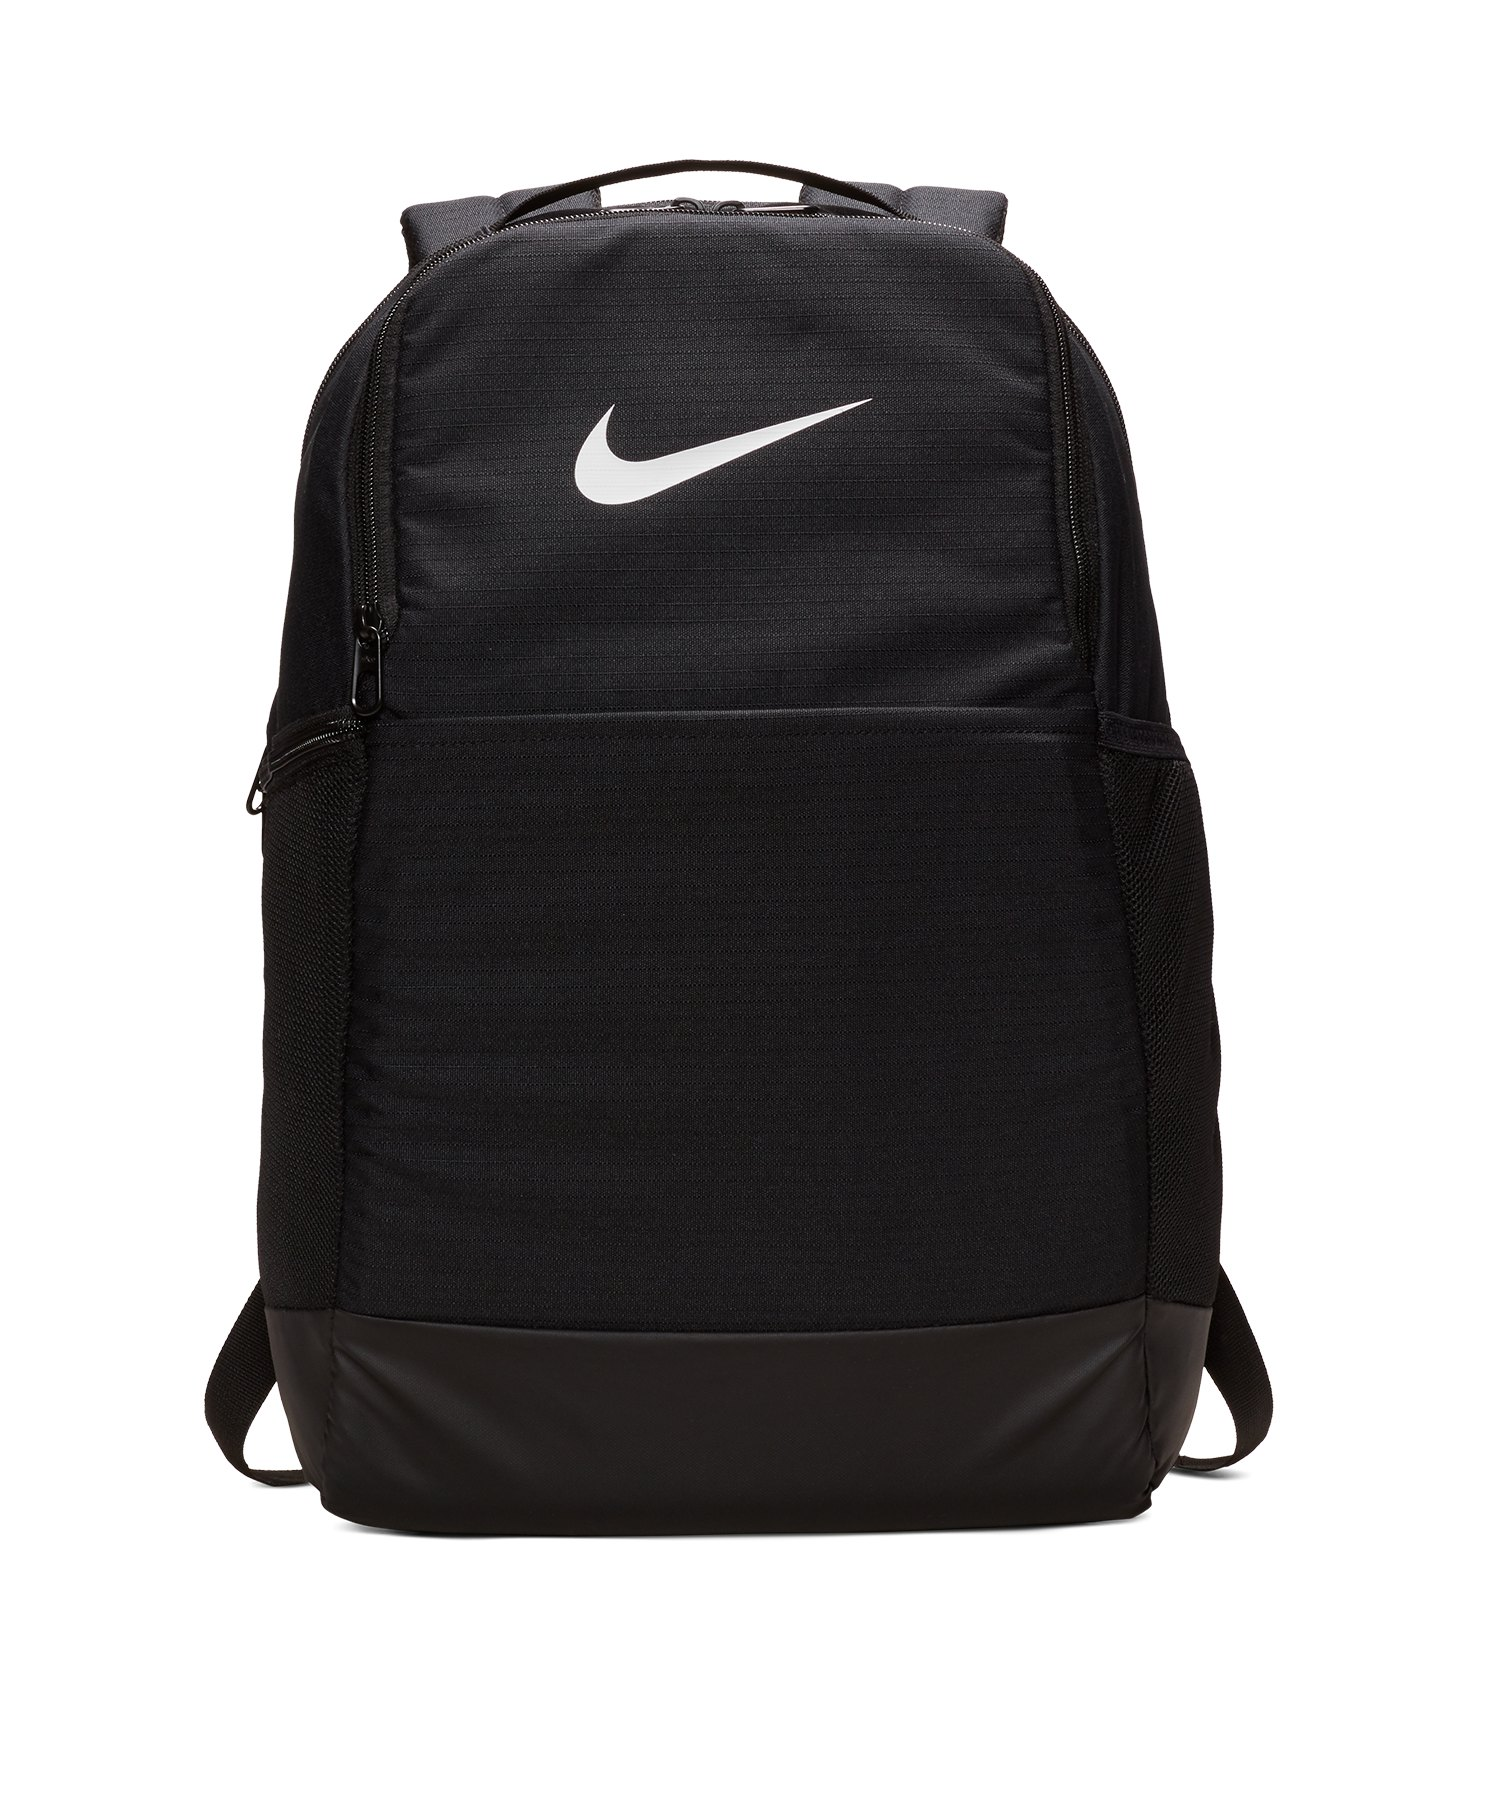 Nike Brasilia Training Rucksack Schwarz F010 - schwarz